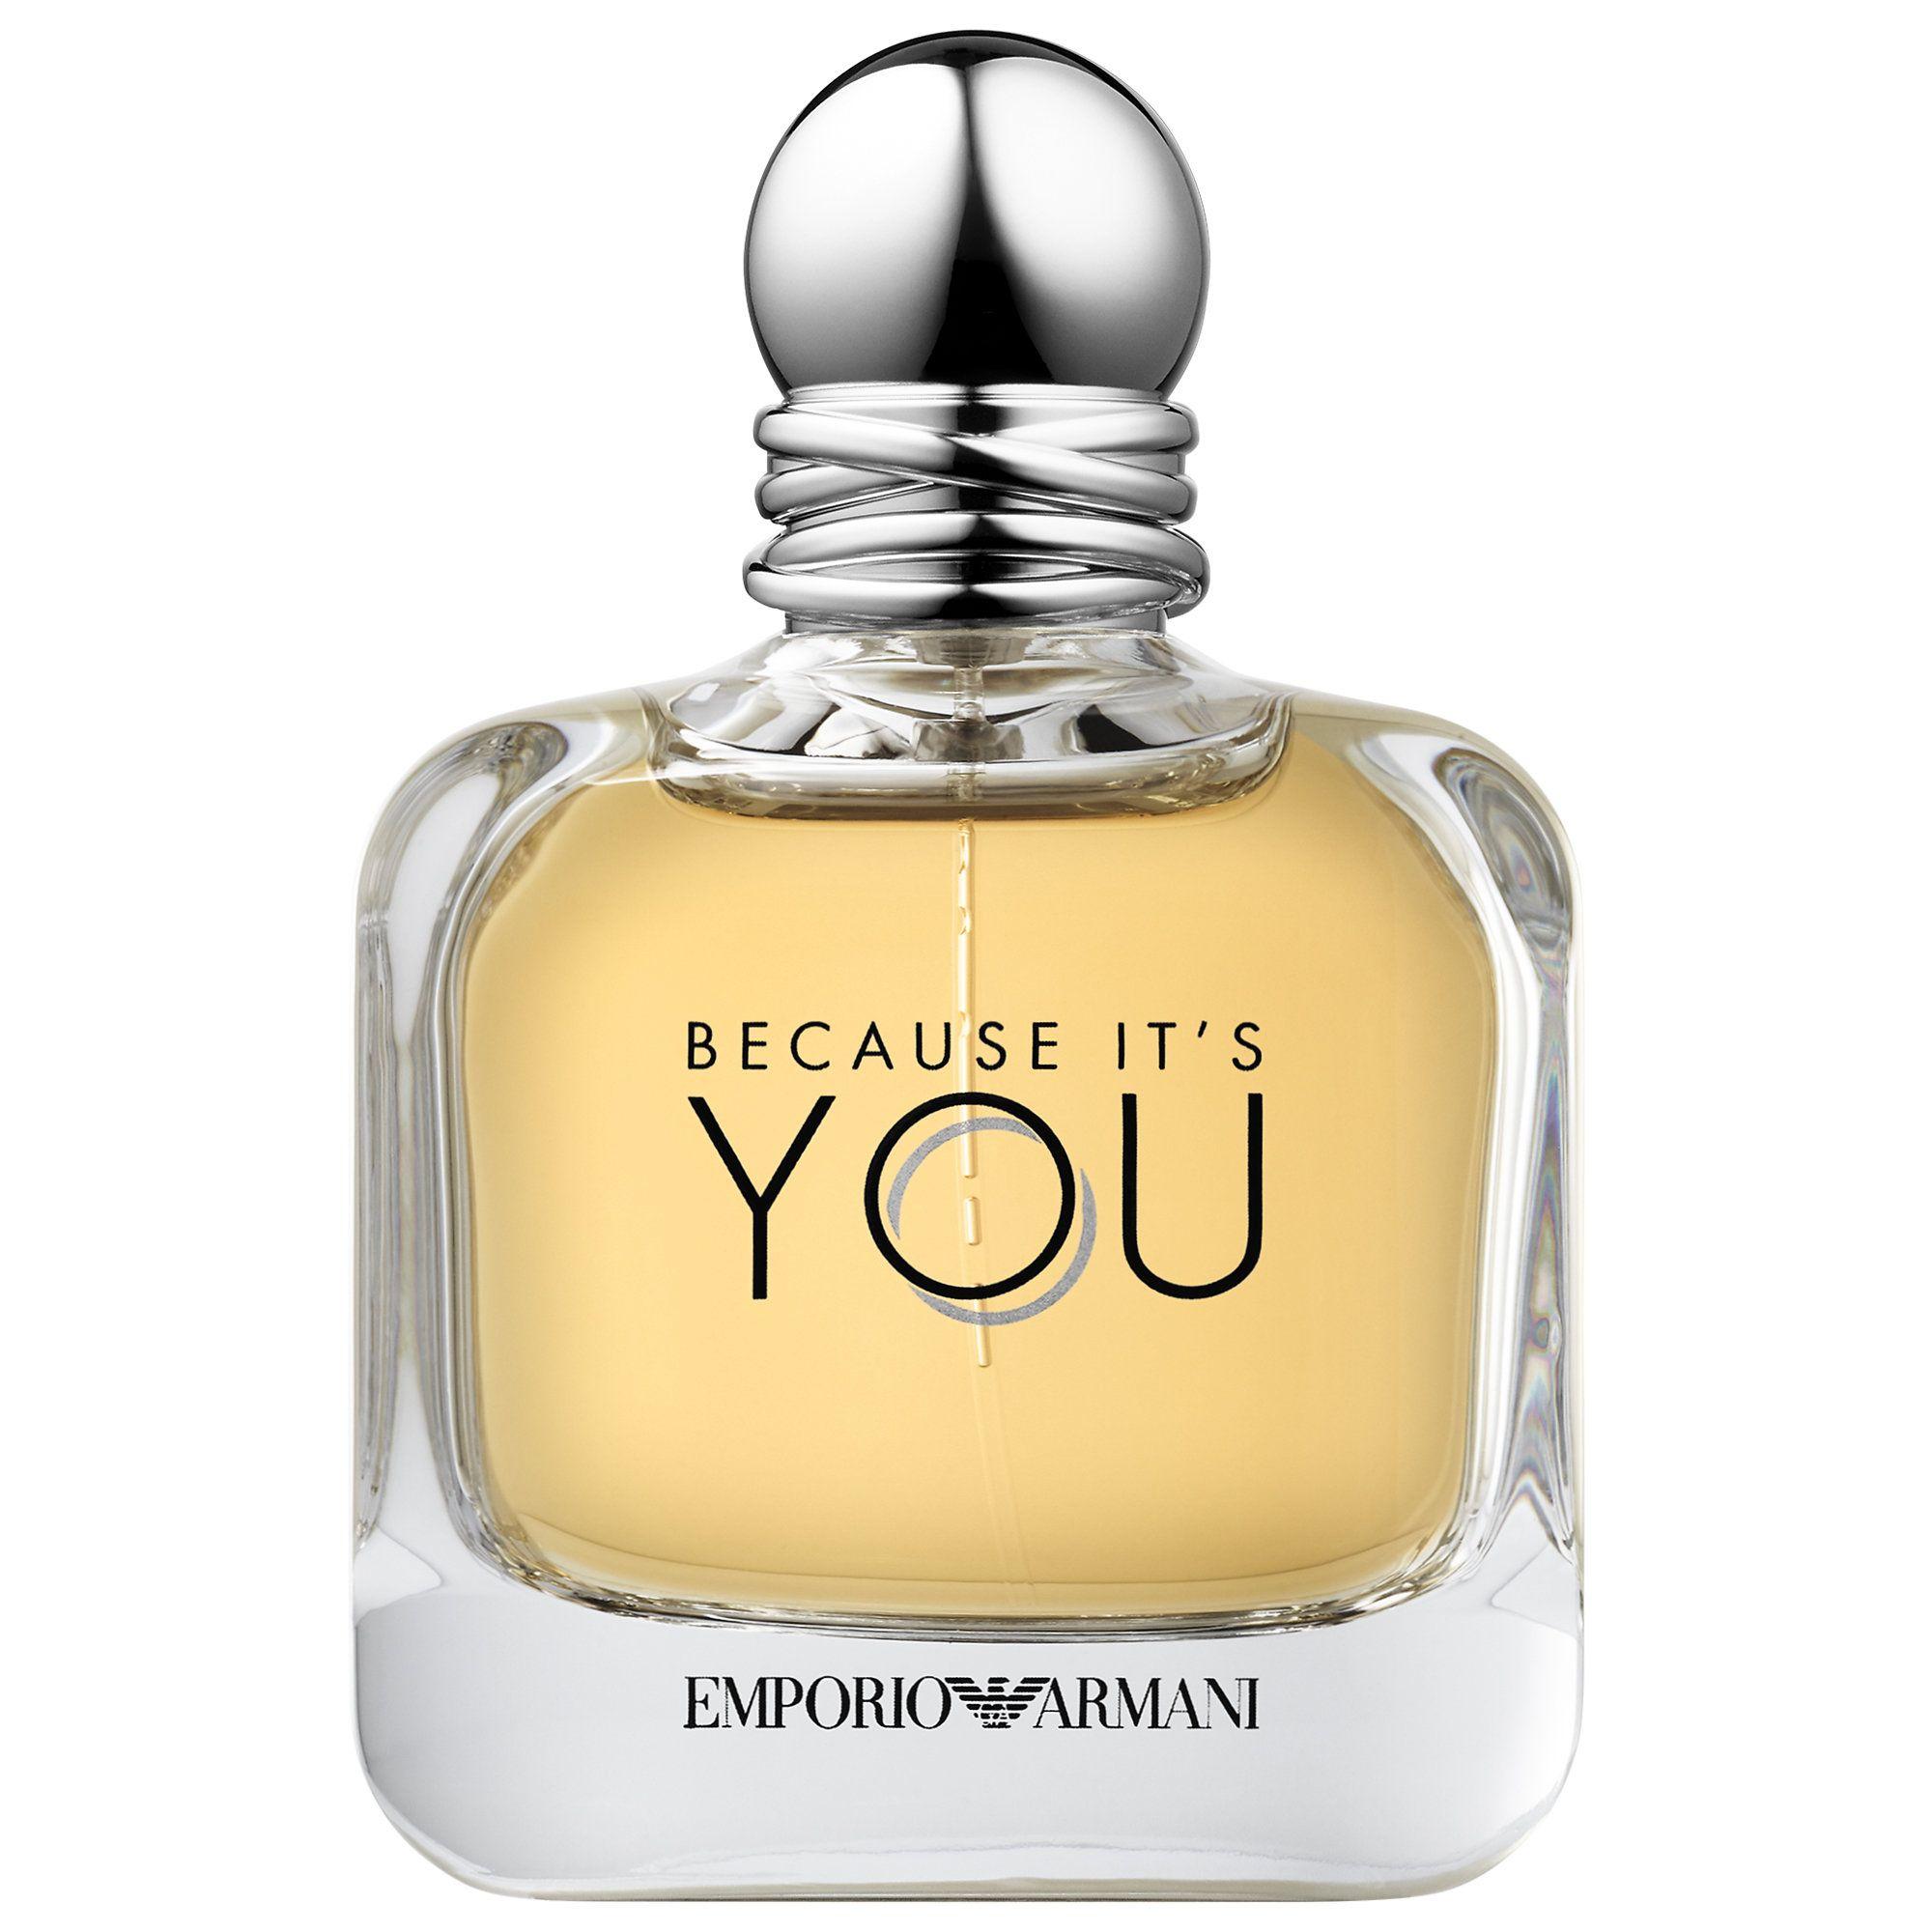 Emporio Because Giorgio Armani BeautySephora It's You 3ASj4RLc5q